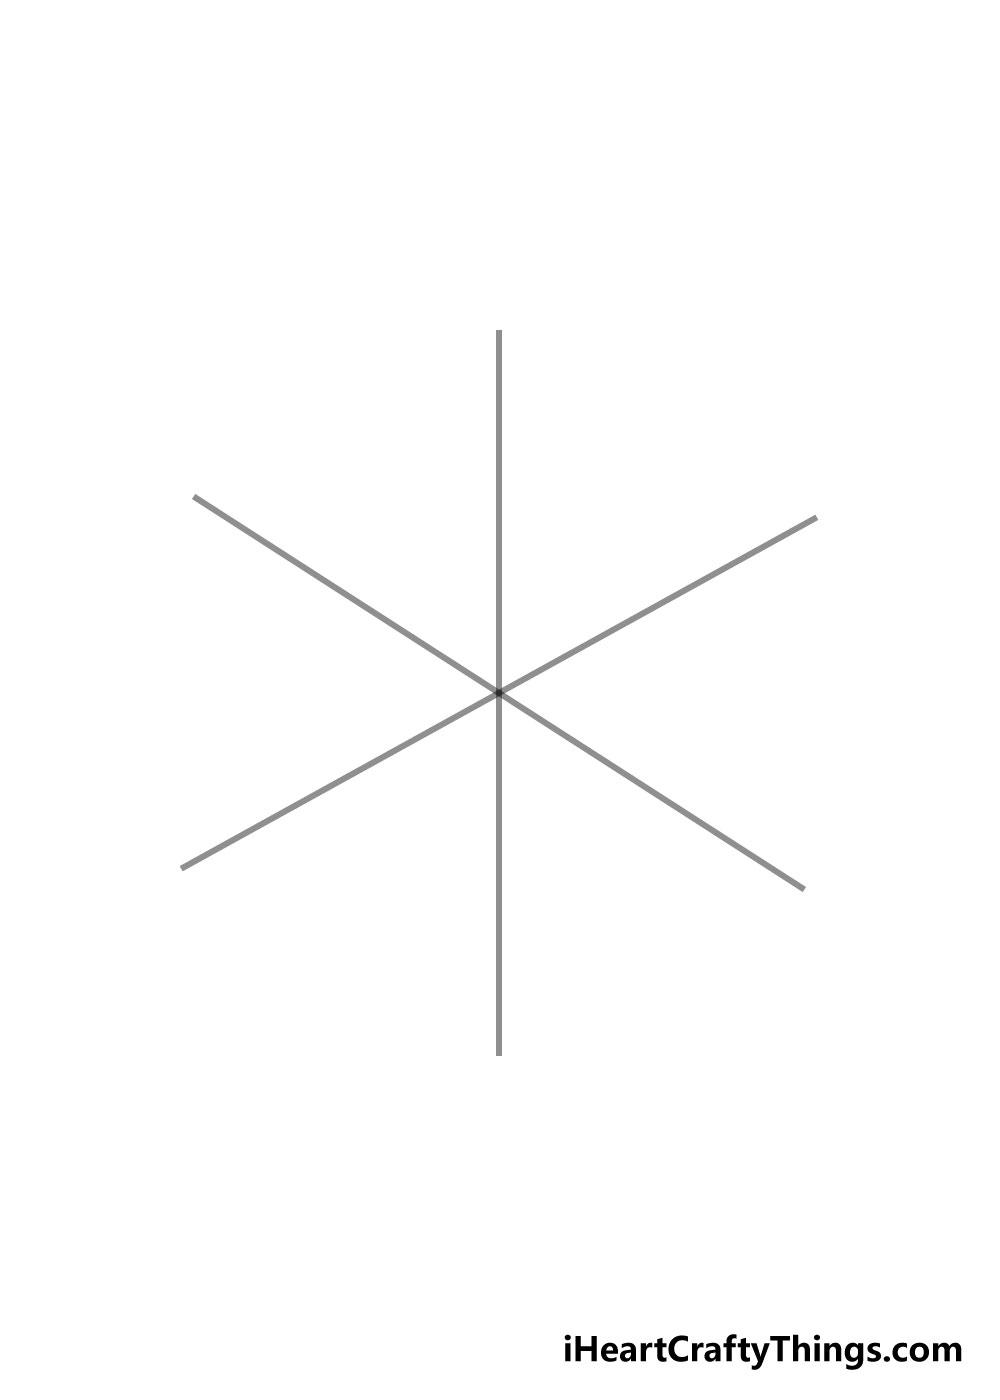 snowflake drawing step 1